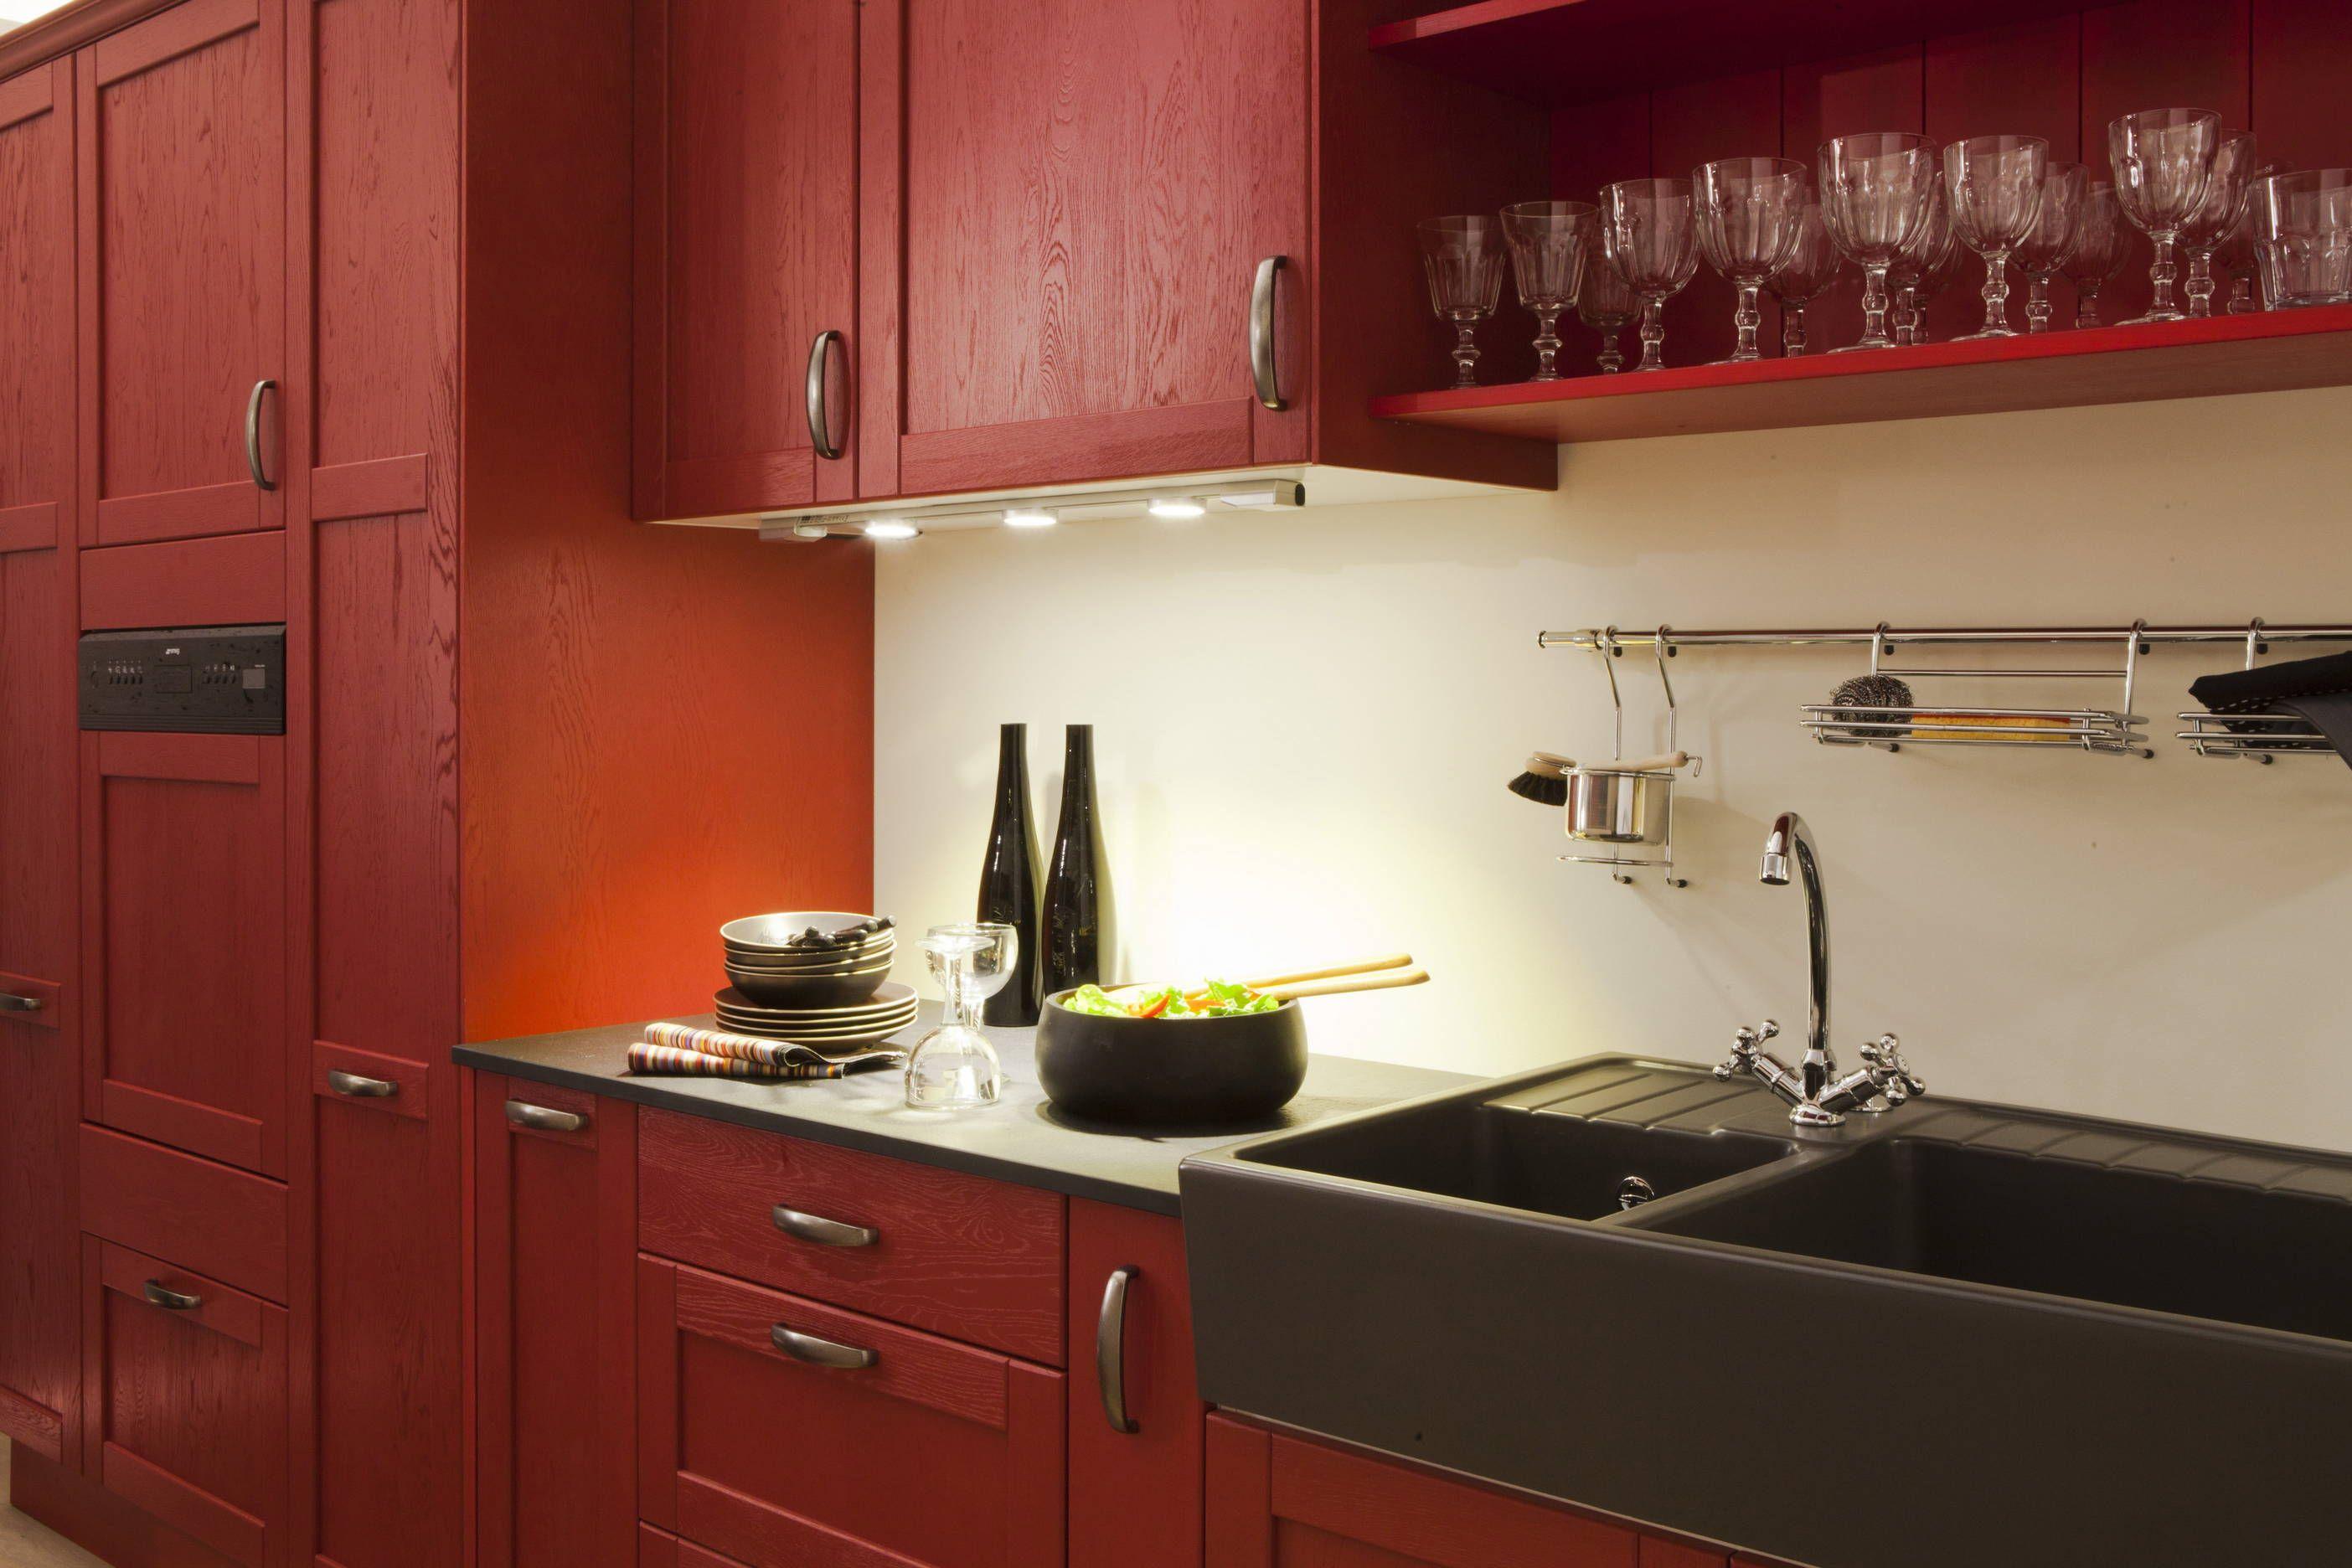 Une cuisine en ch ne massif patin rouge cuisine pinterest house for Cuisine leroy merlin rouge